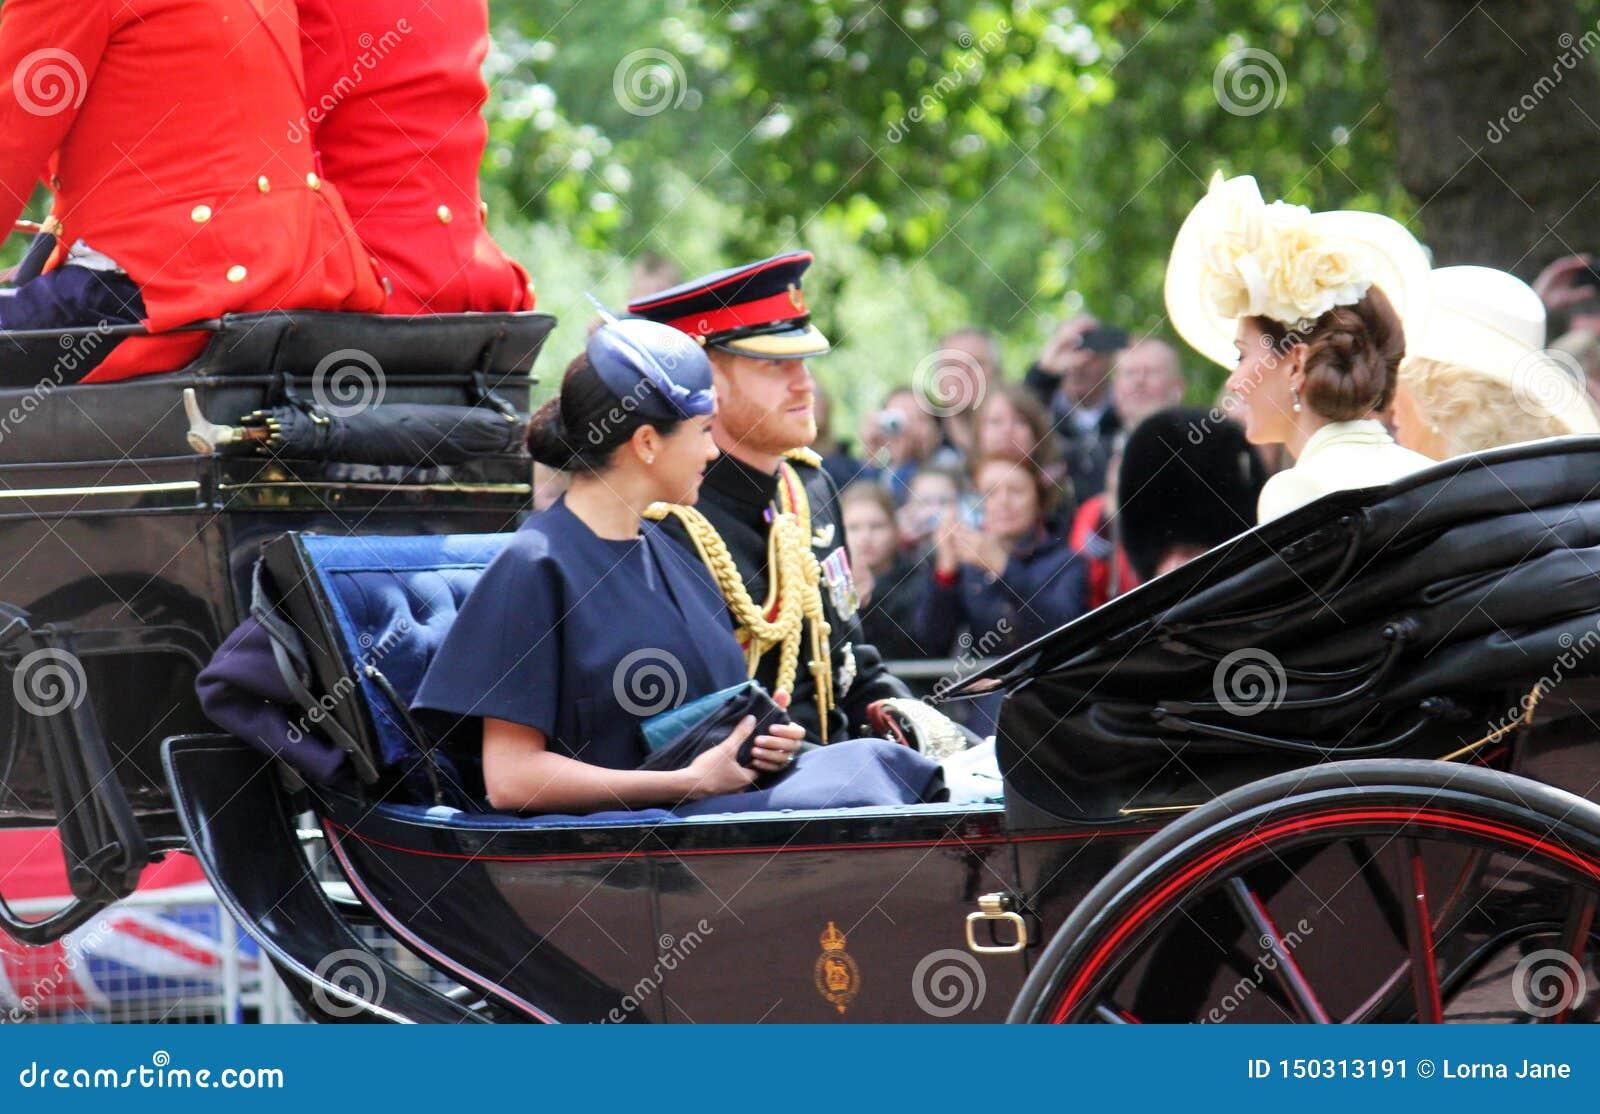 Meghan Markle, Londyński uk 8 2019 Czerwiec - Meghan Markle Kate Middleton książe Harry Camilla Parker Bowles zapasu fotografia